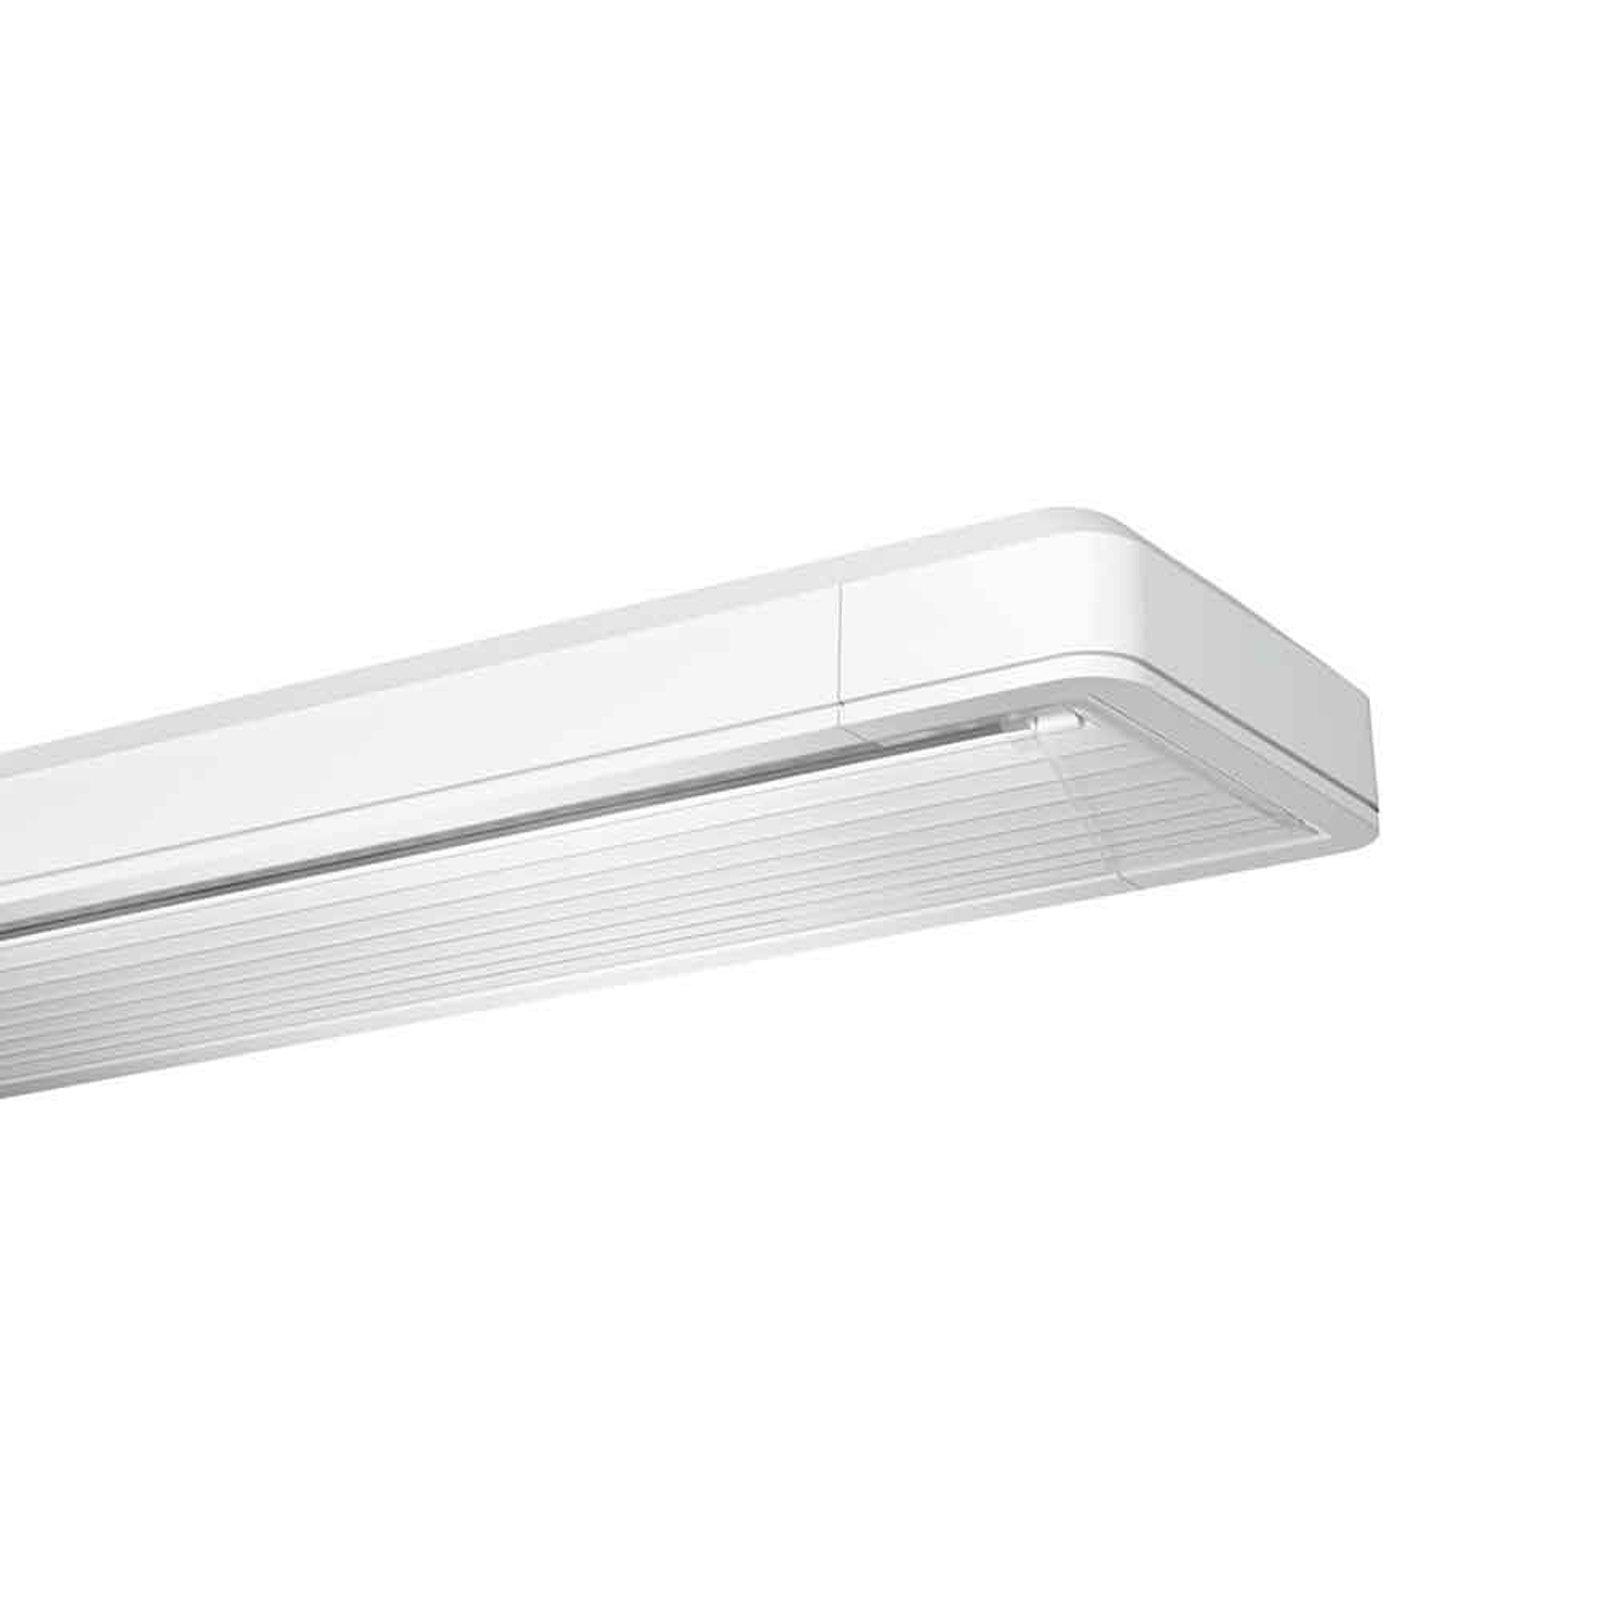 Siteco Taris LED-taklampe 151 cm el. ball. DALI